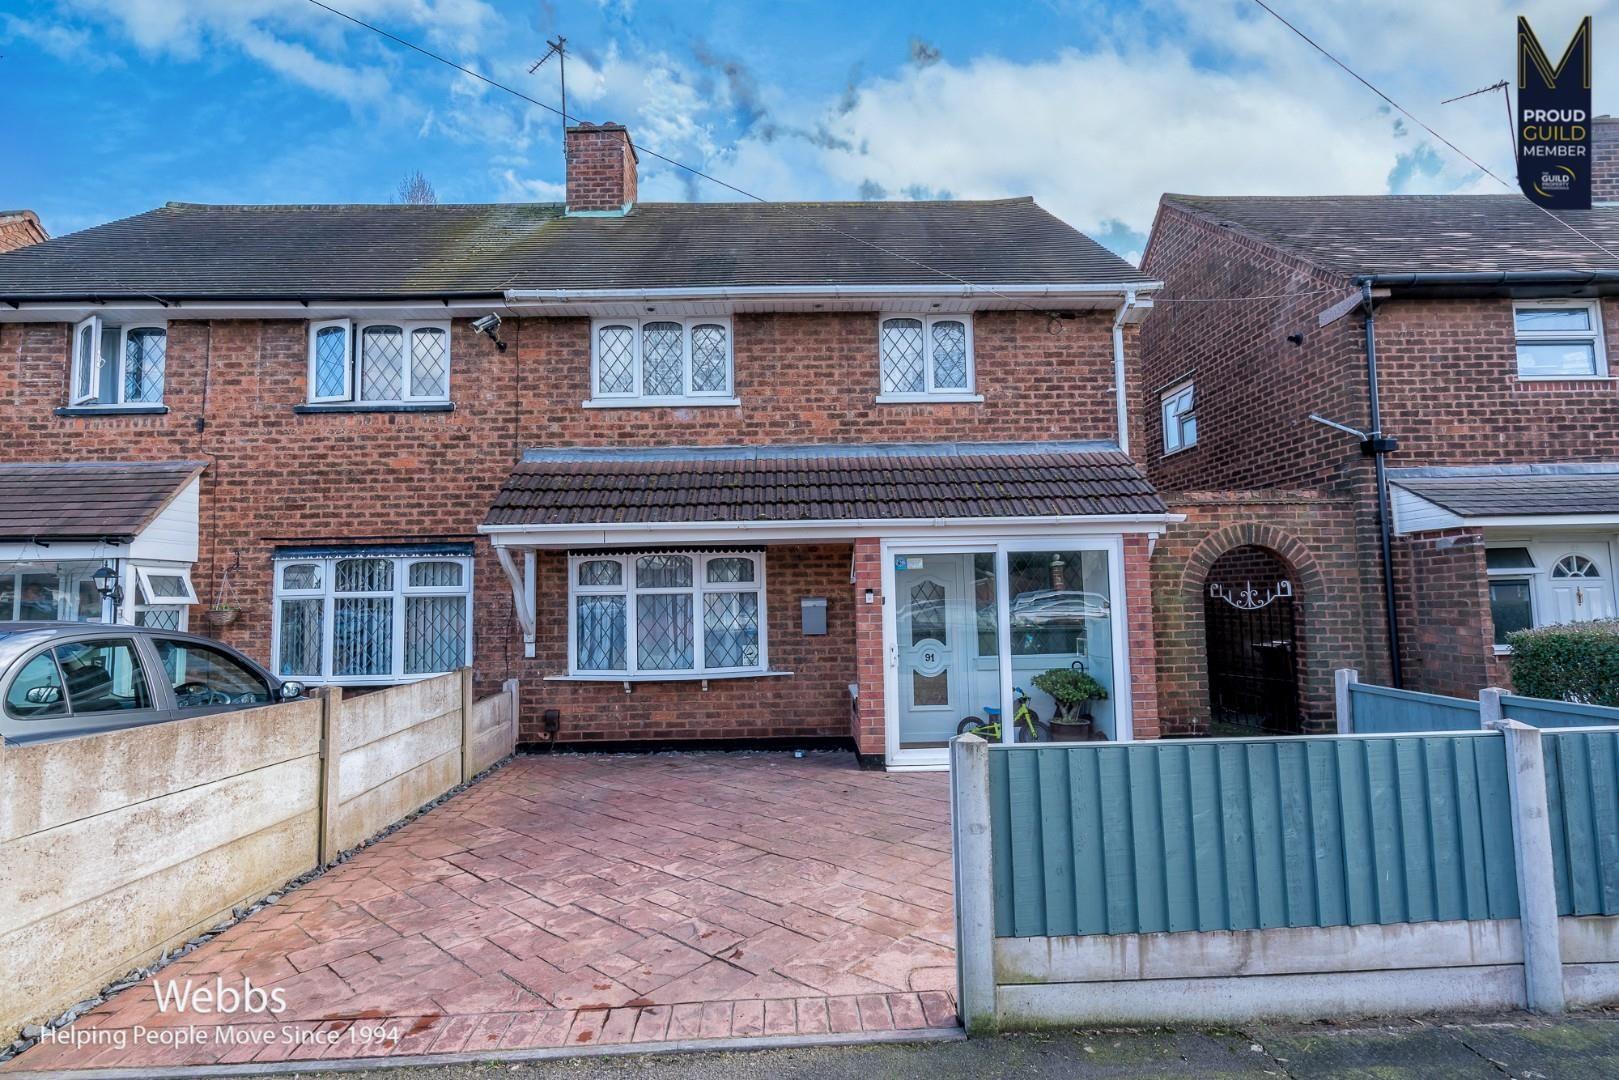 Property photo 1 of 21. 91, Gower Street, Walsall, Staffordshire, Ws2 9Az-